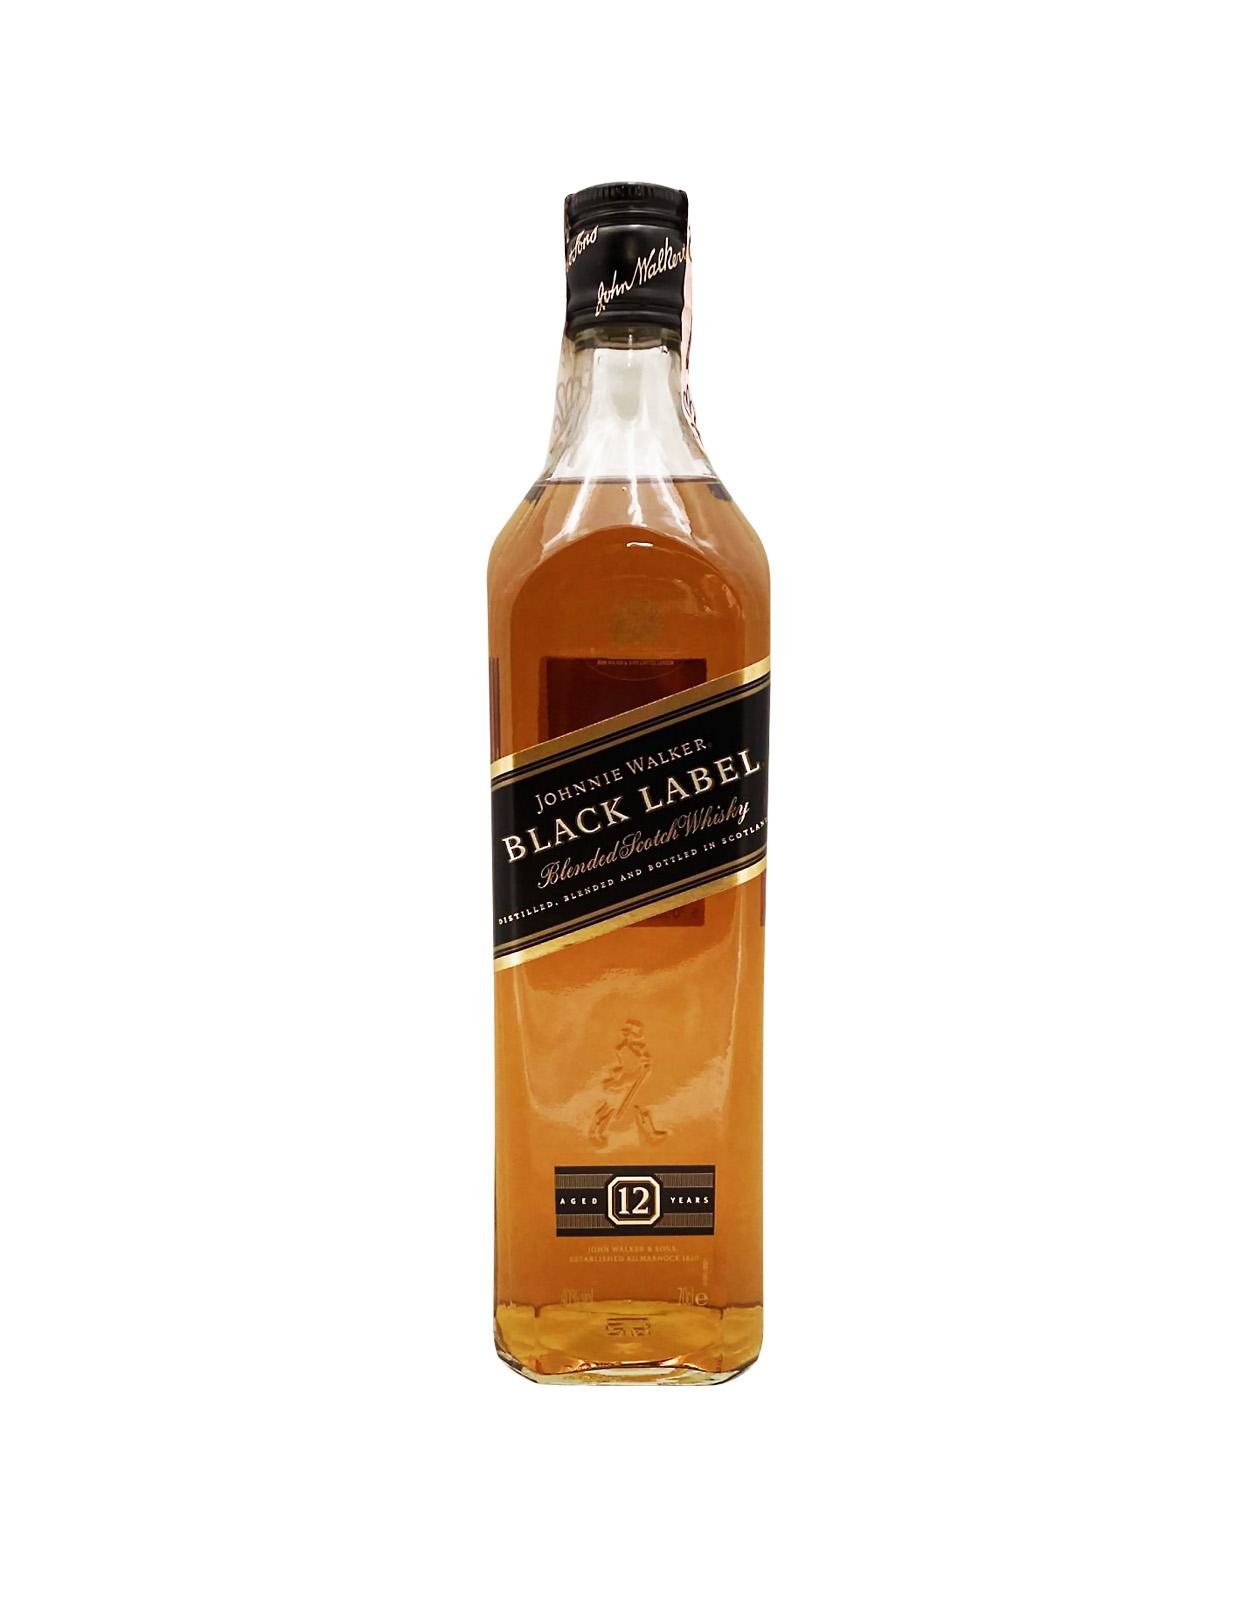 Johnnie Walker Black Label 12YO 40%, Bottleshop Sunny wines slnecnice mesto, petrzalka, Škótska Whisky, rozvoz alkoholu, eshop